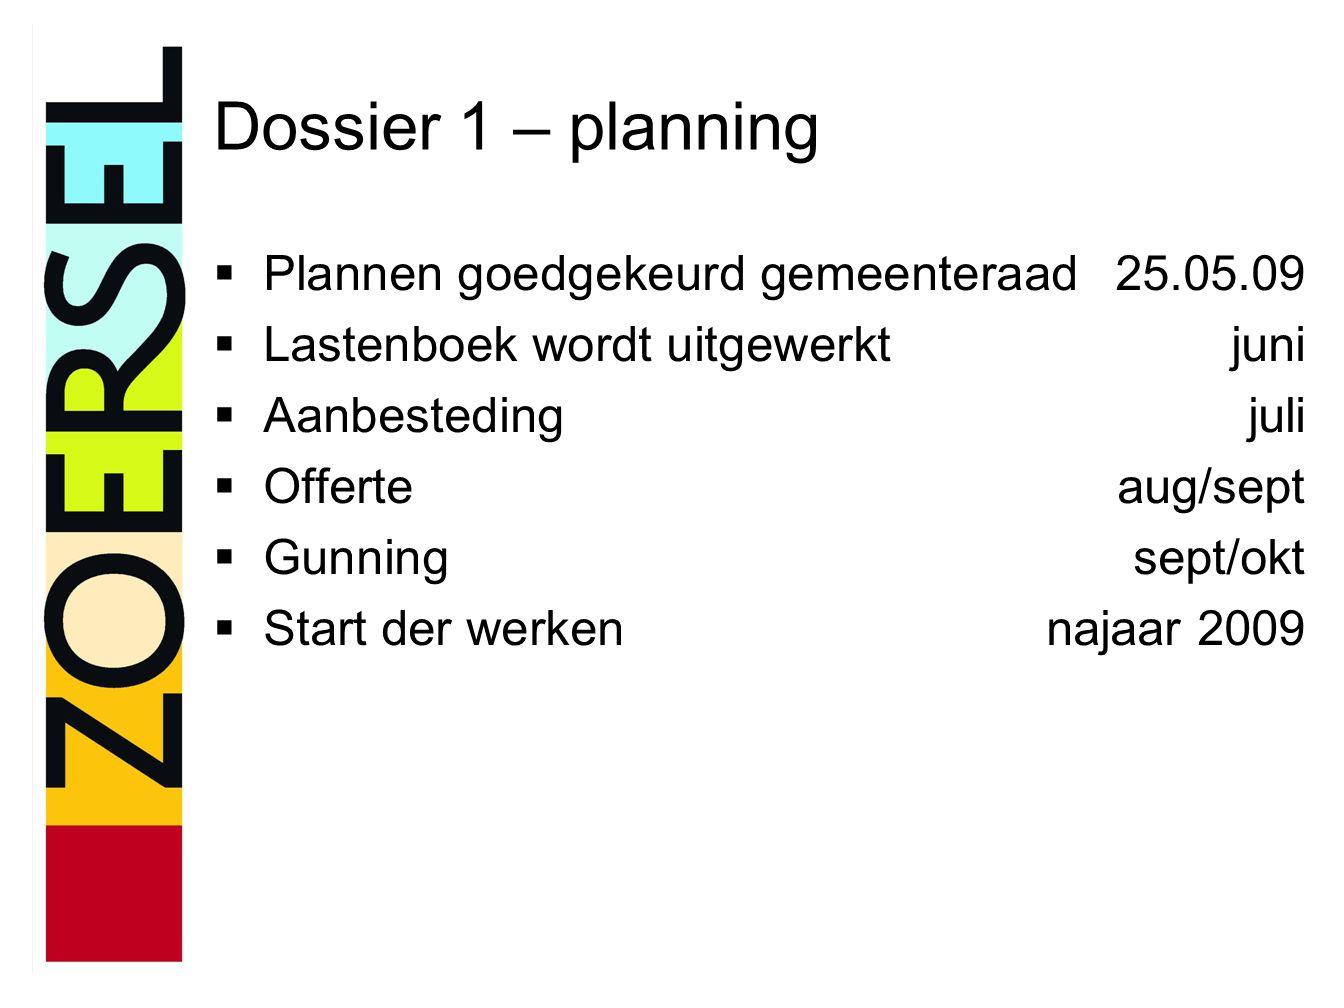 Dossier 1 – planning  Plannen goedgekeurd gemeenteraad25.05.09  Lastenboek wordt uitgewerktjuni  Aanbestedingjuli  Offerteaug/sept  Gunningsept/o